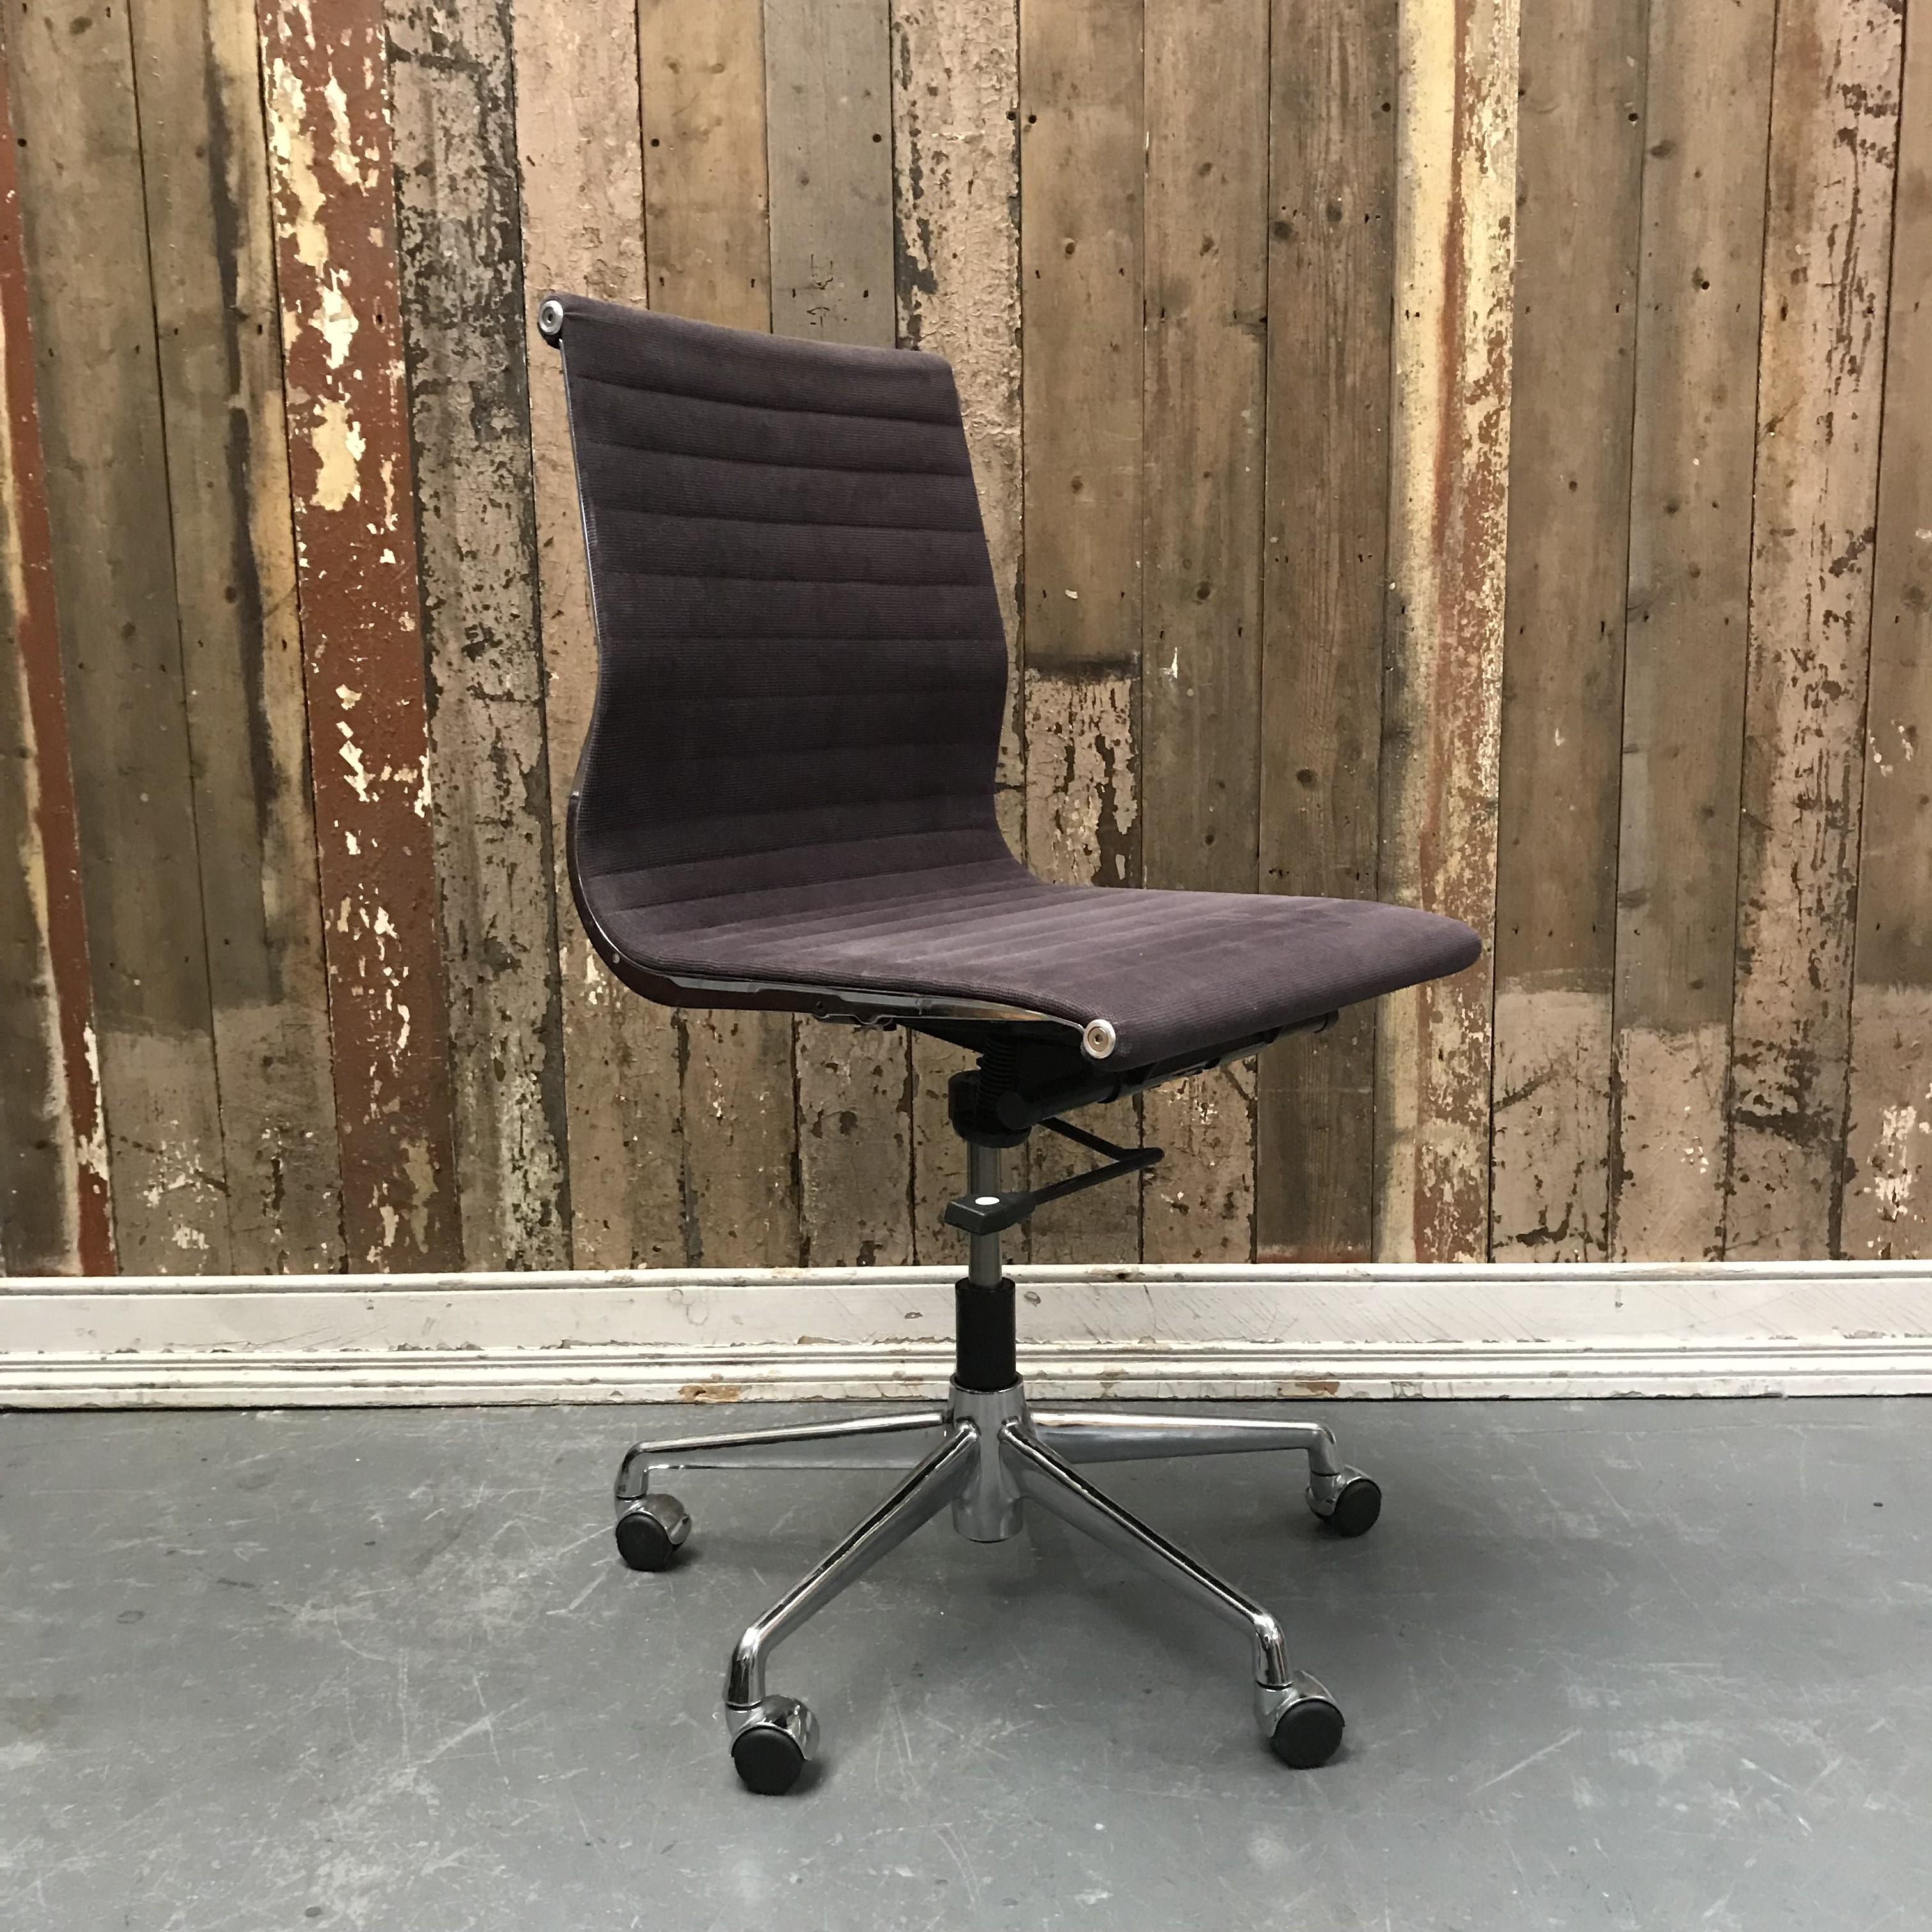 Z0423 Desk Computer Chairs X 14